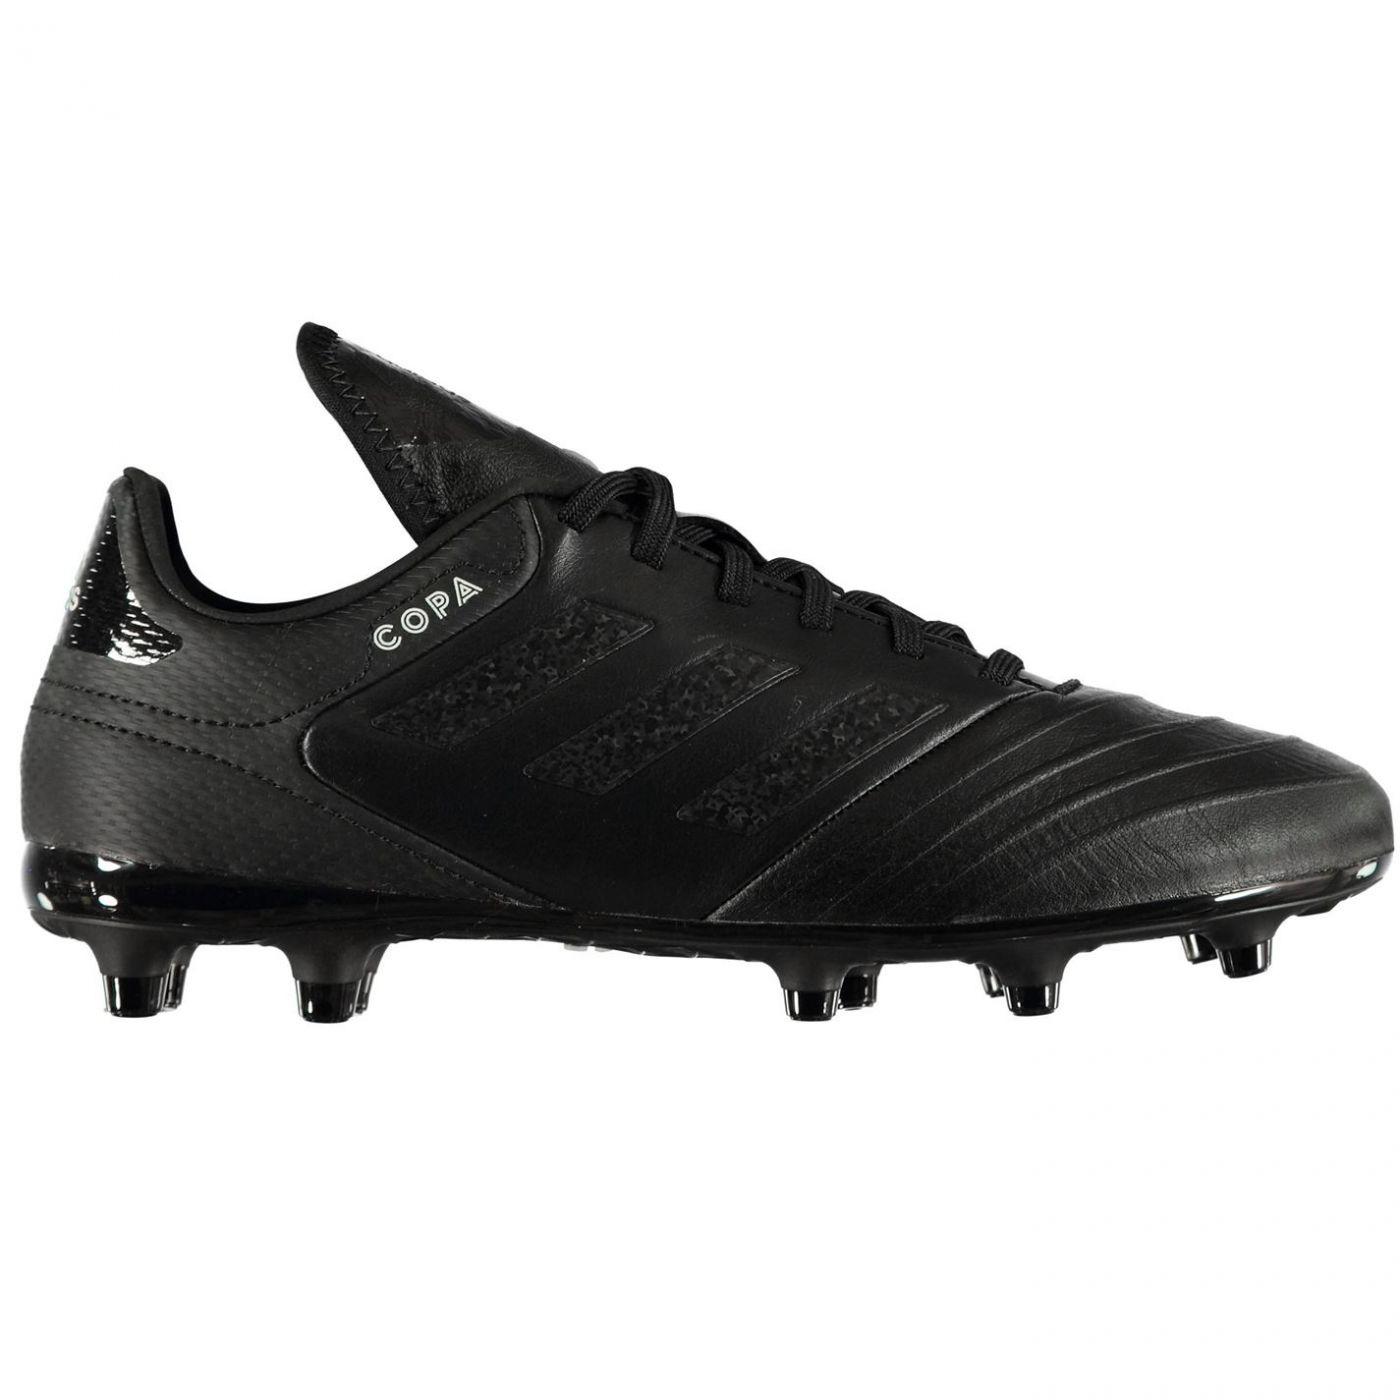 Adidas Copa 18.3 Mens FG Football Boots